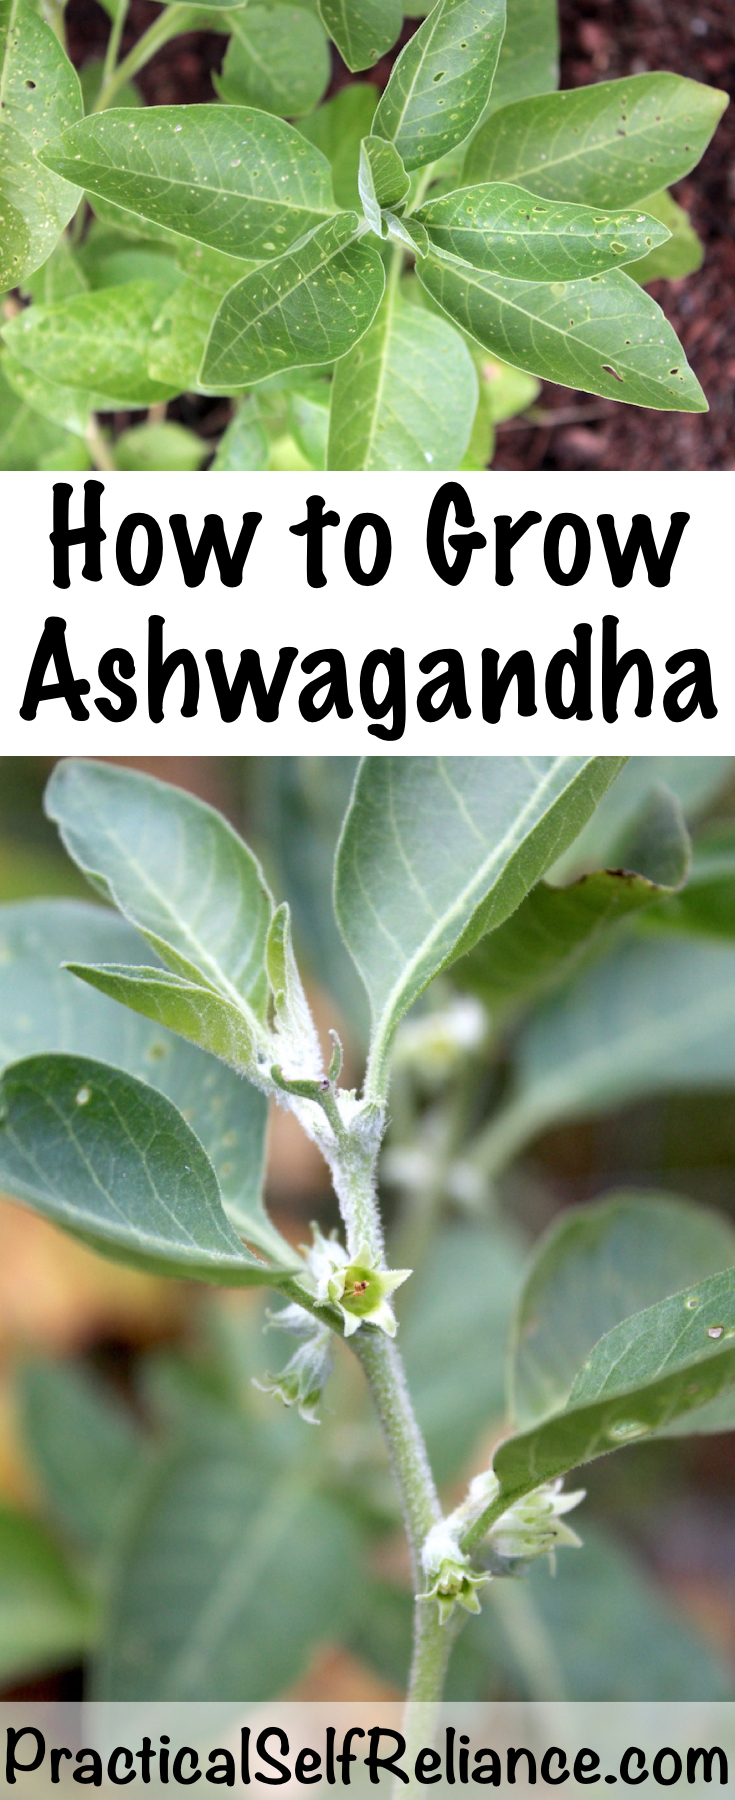 How to Grow Ashwagandha #Ashwagandha #herbs #growingherbs #howtogrow #herbalism #selfsufficiency #homesteading #medicine